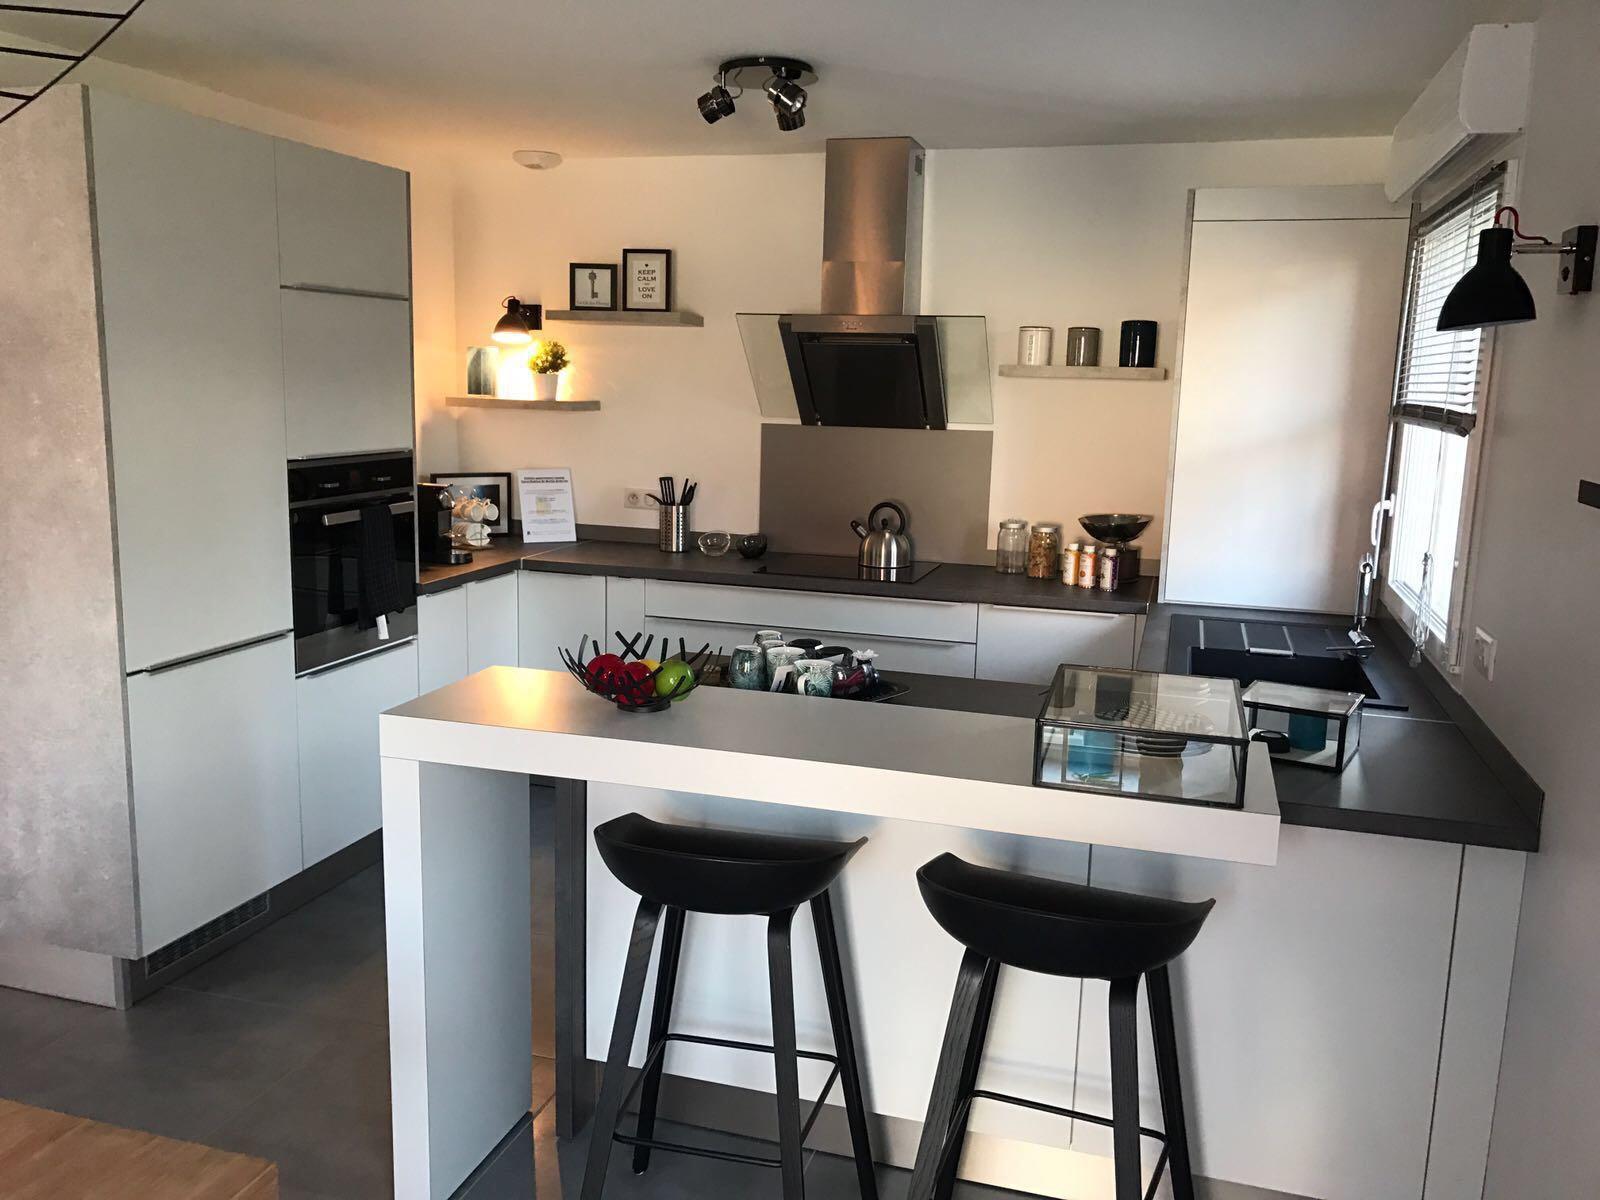 N734-SM - Appartement T3 neuf à Saint-Martin-Bellevue